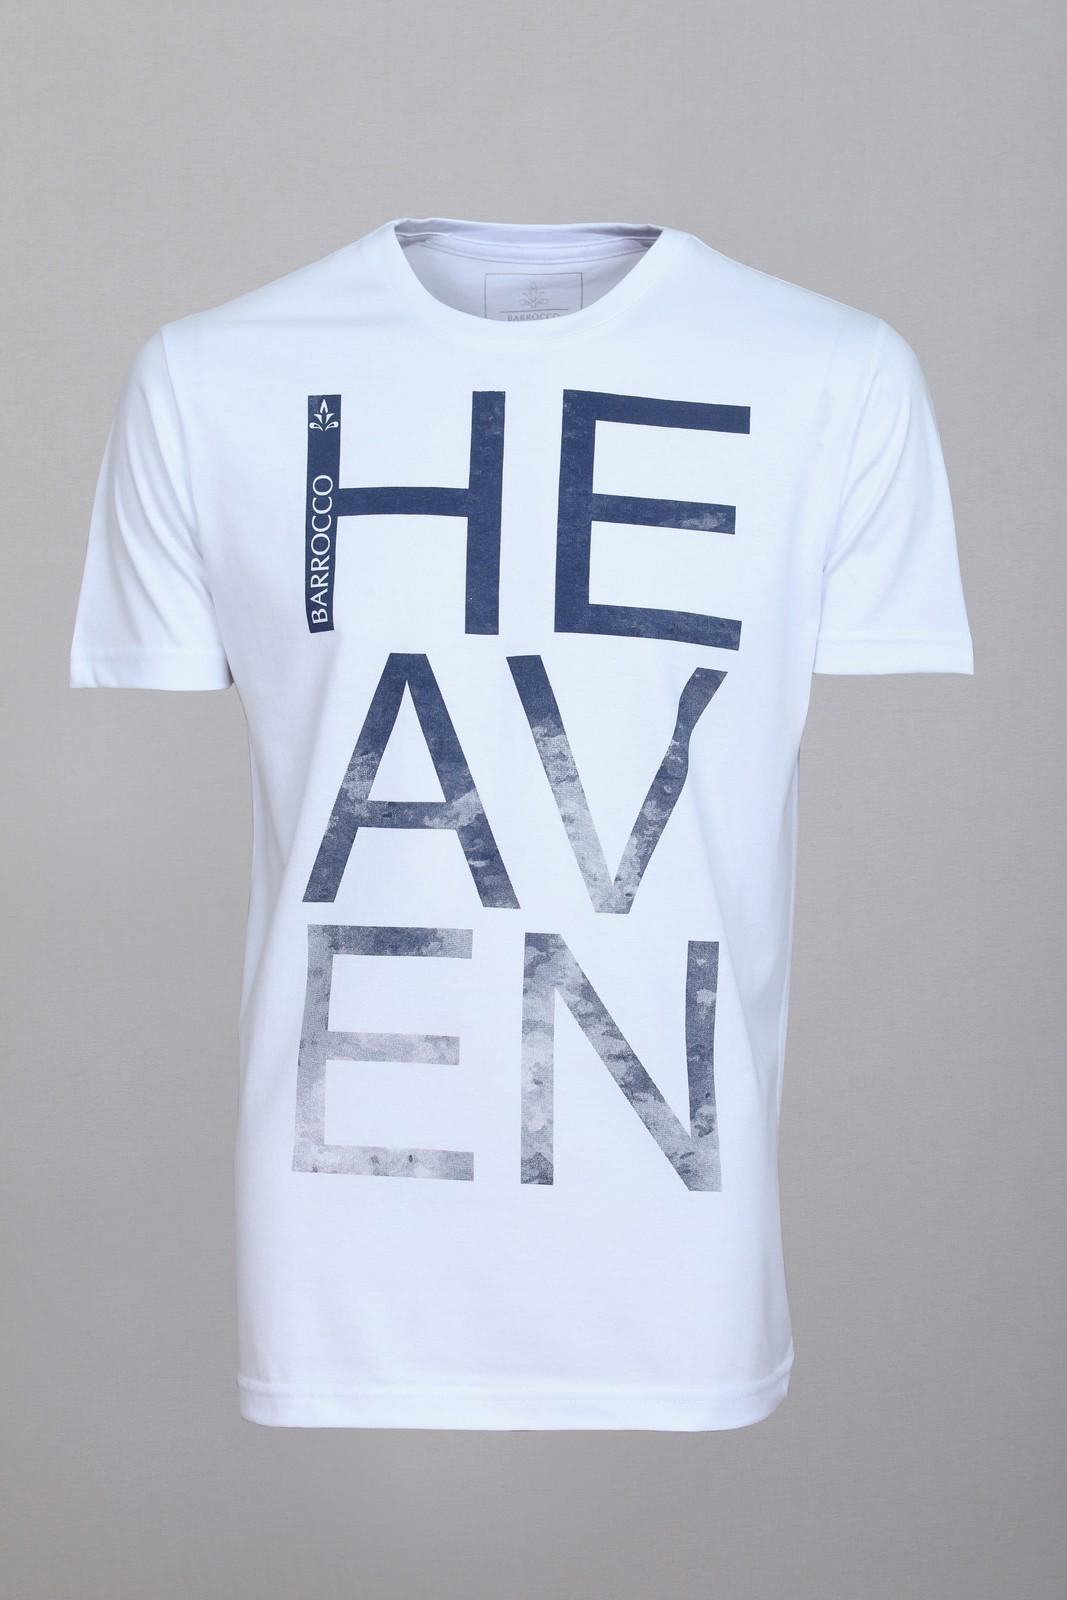 Camiseta Barrocco Heaven - FRETE GRÁTIS